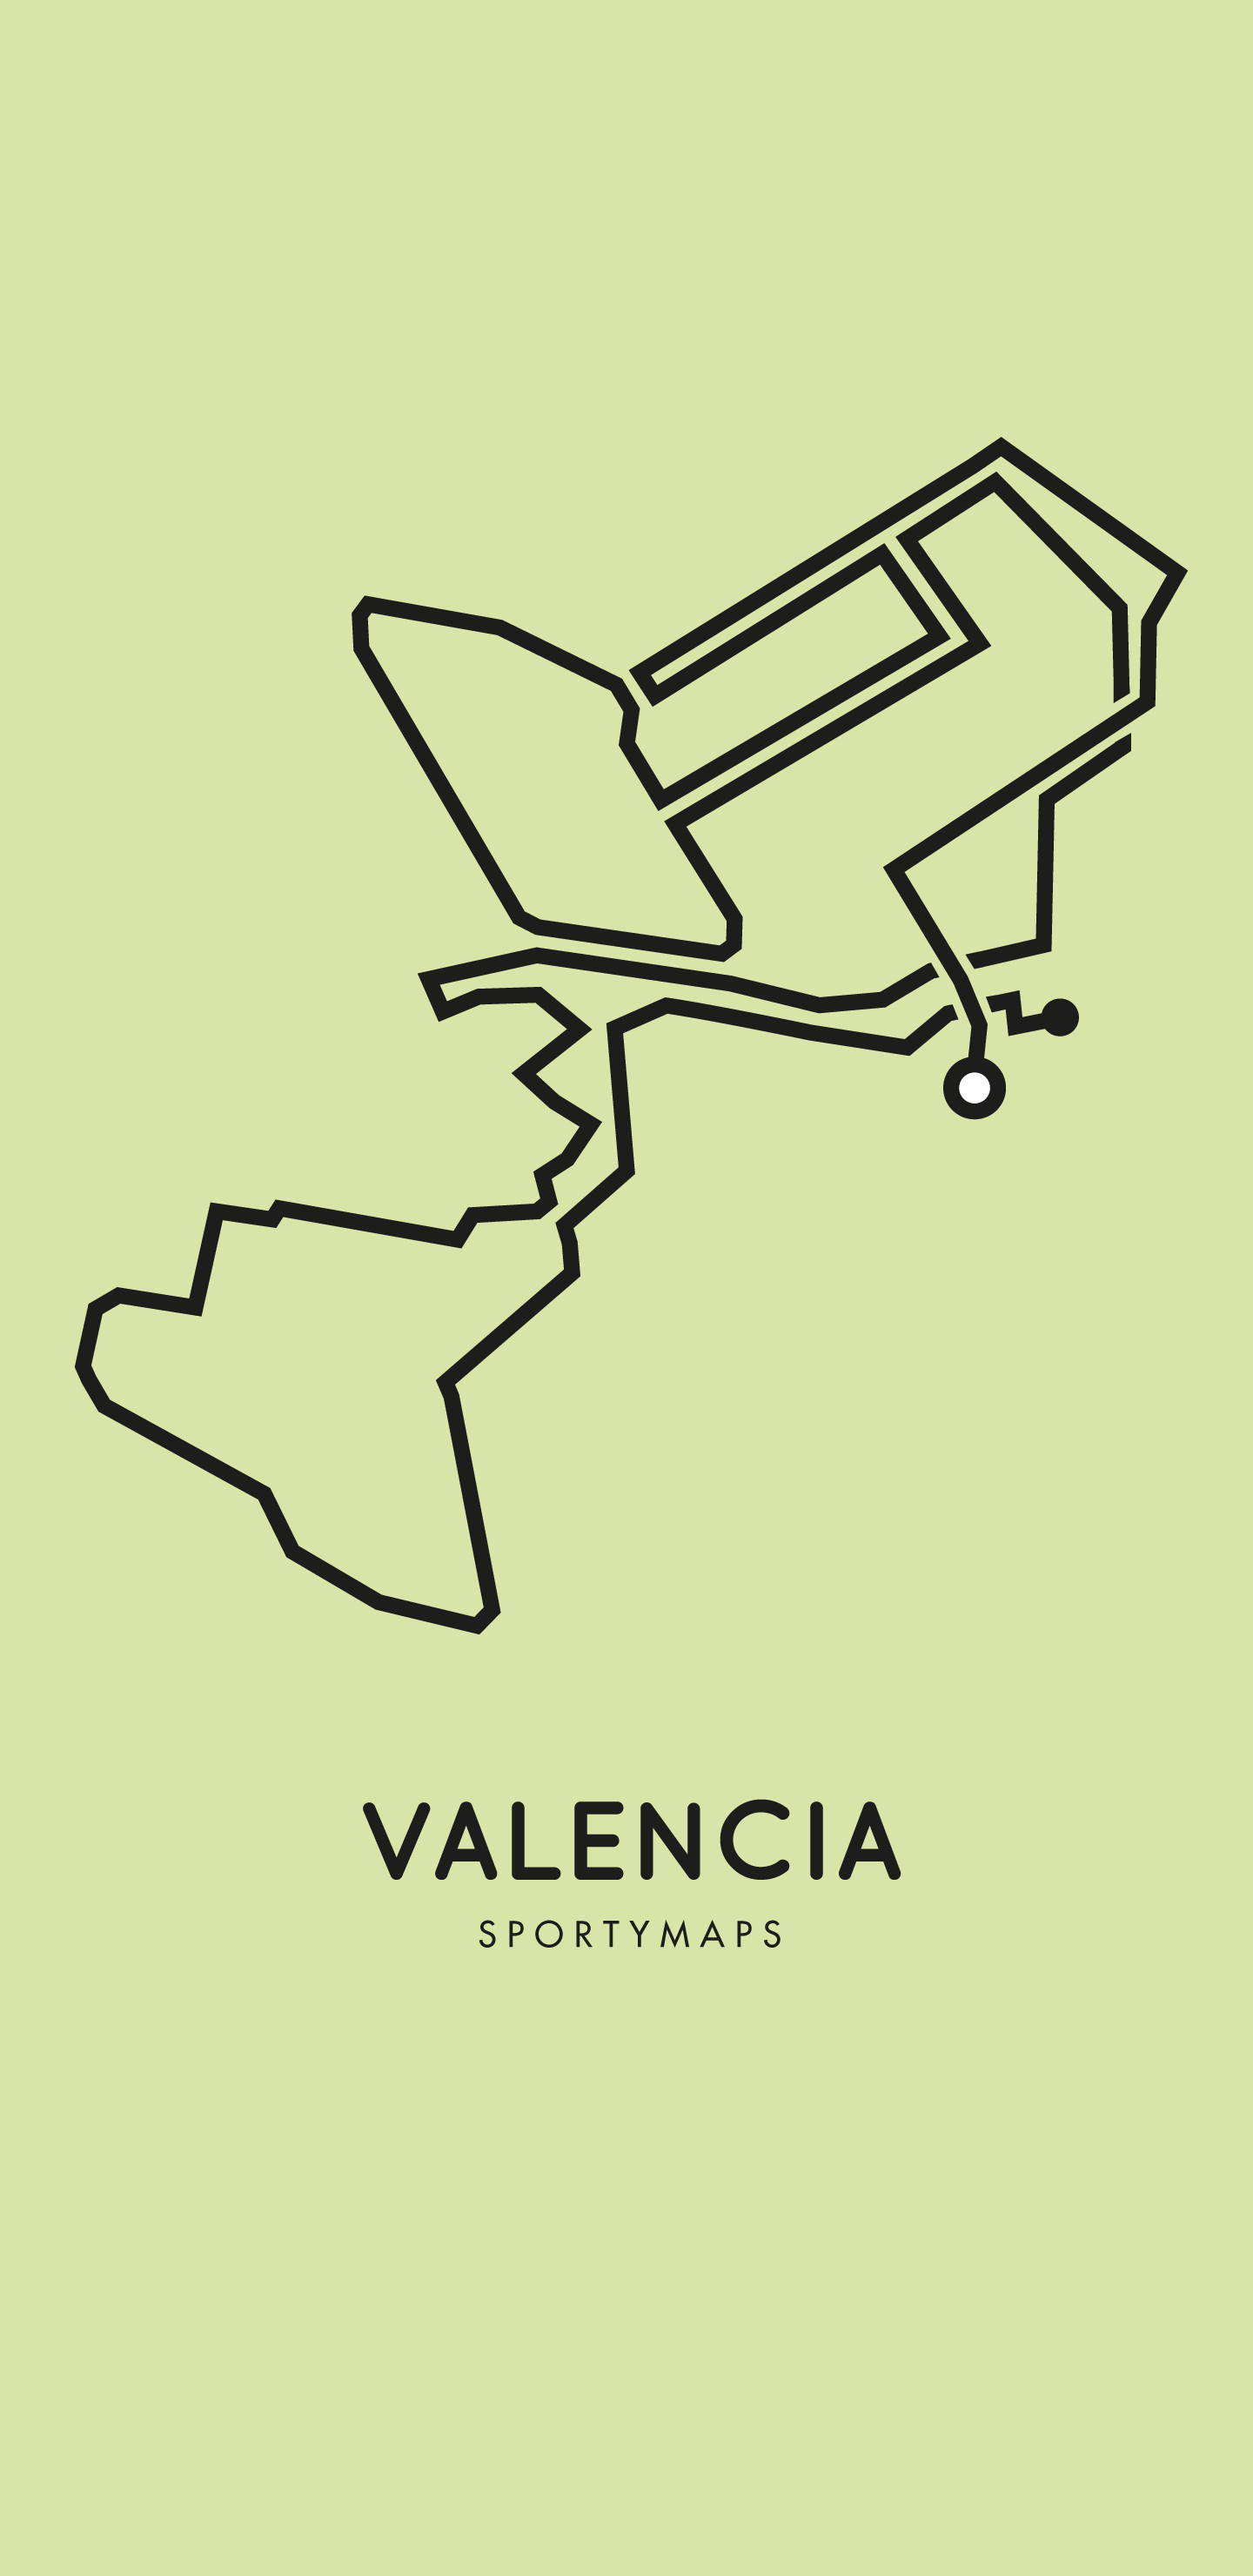 Sportymaps-Valencia-marathon-green